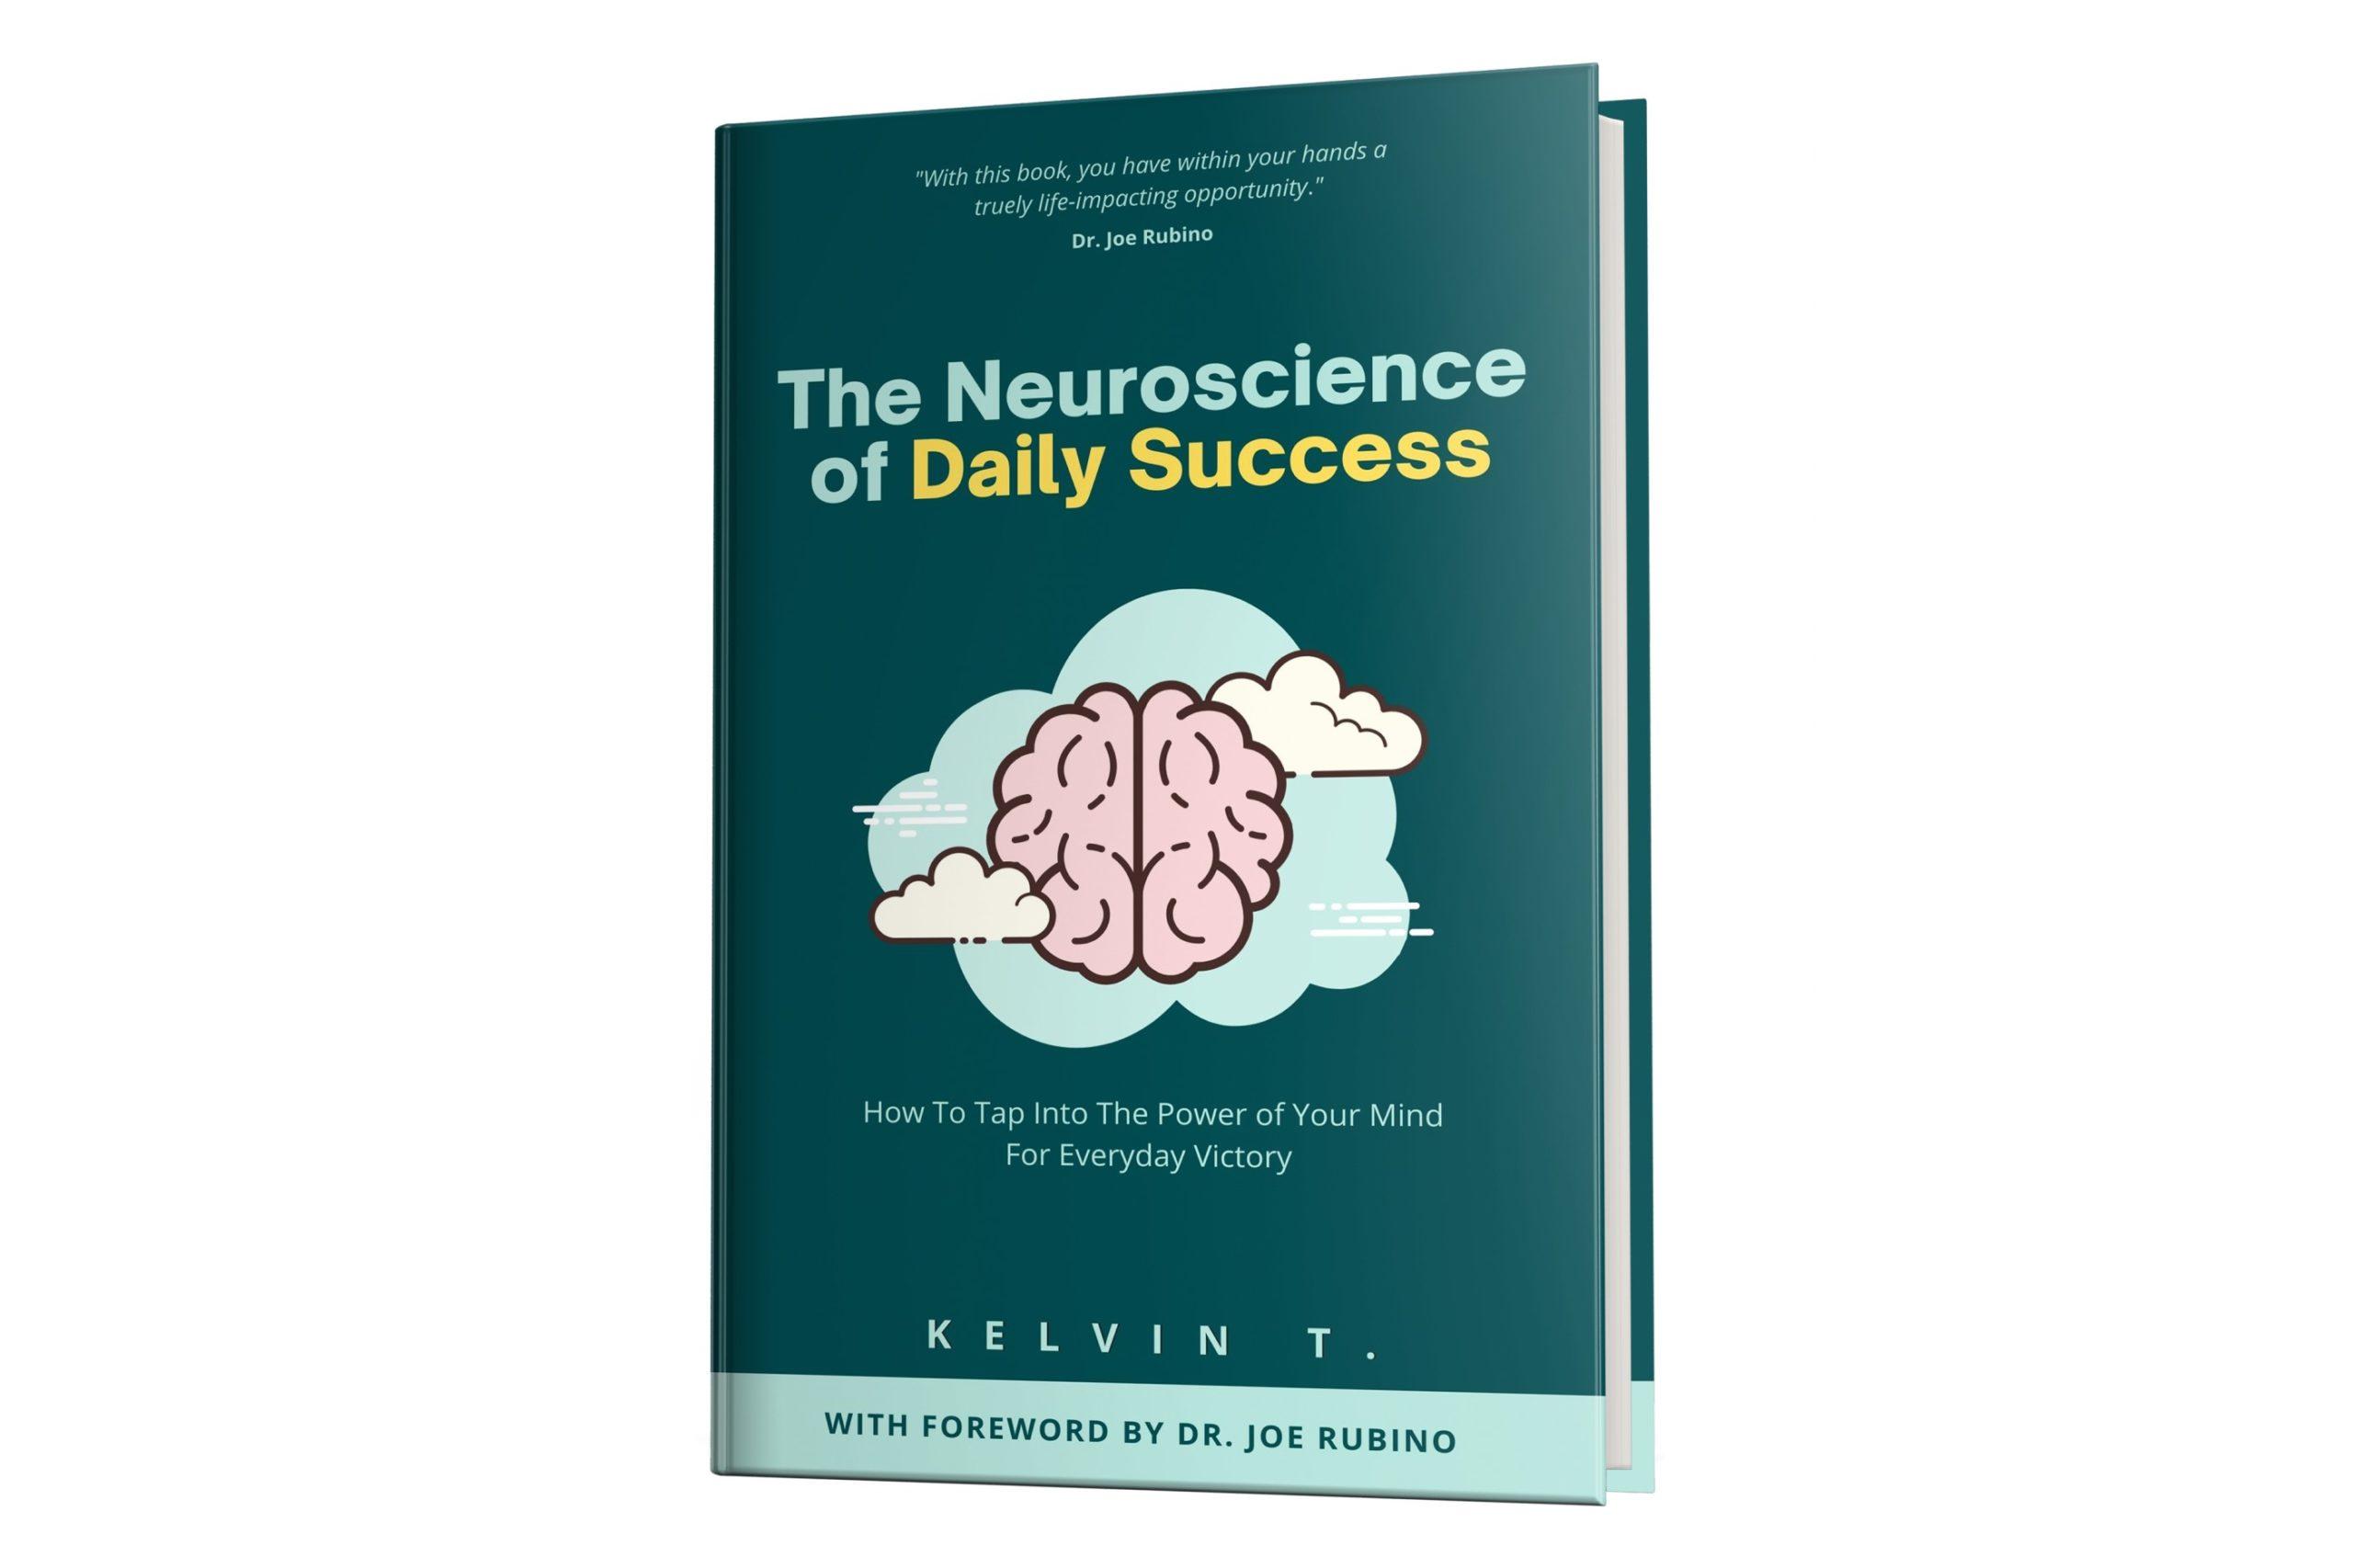 The Neuroscience of Daily Success